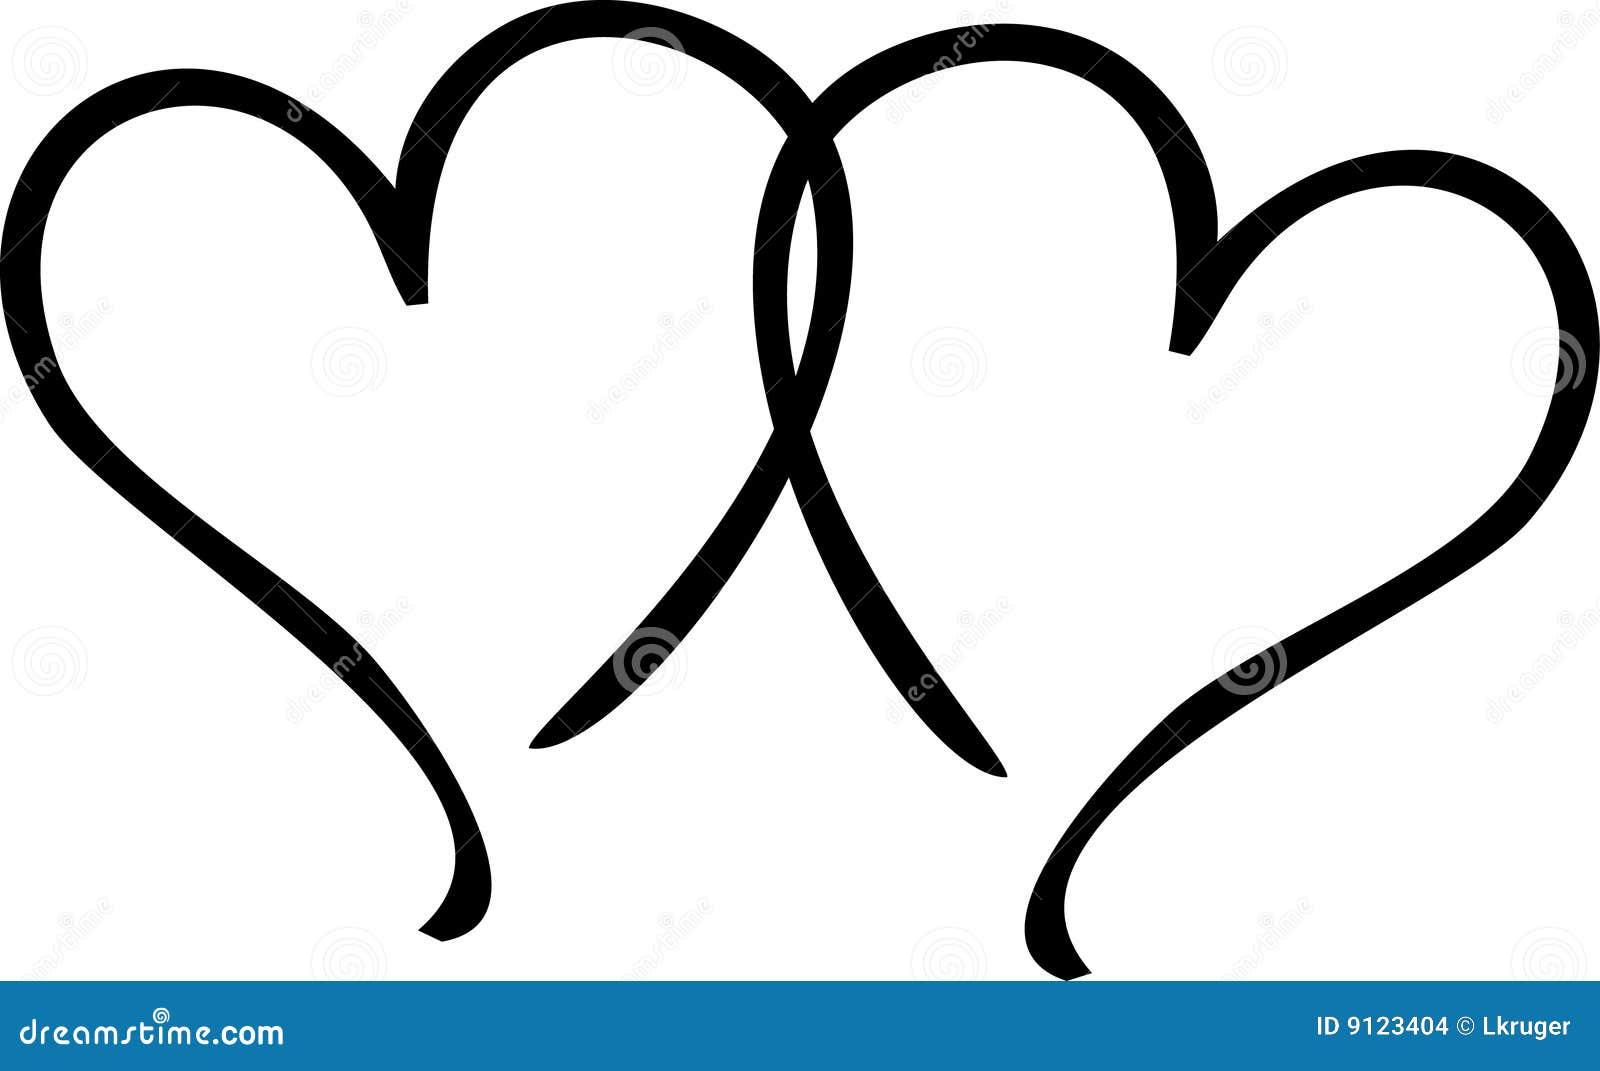 Two Hearts stock illus...